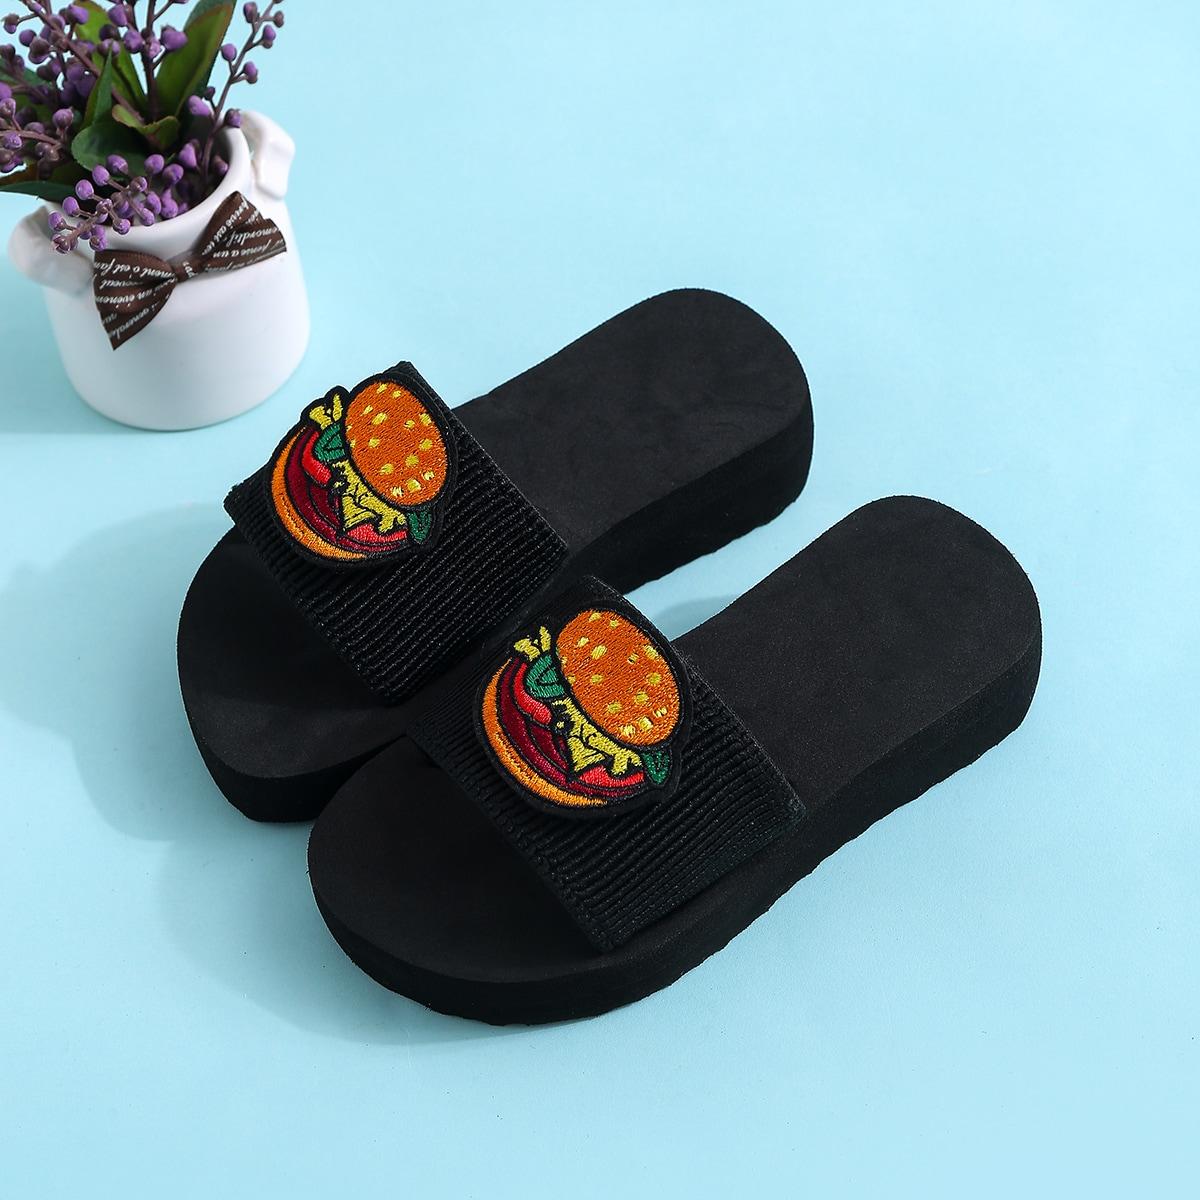 Шлепанцы с вышивкой гамбургера для девочек